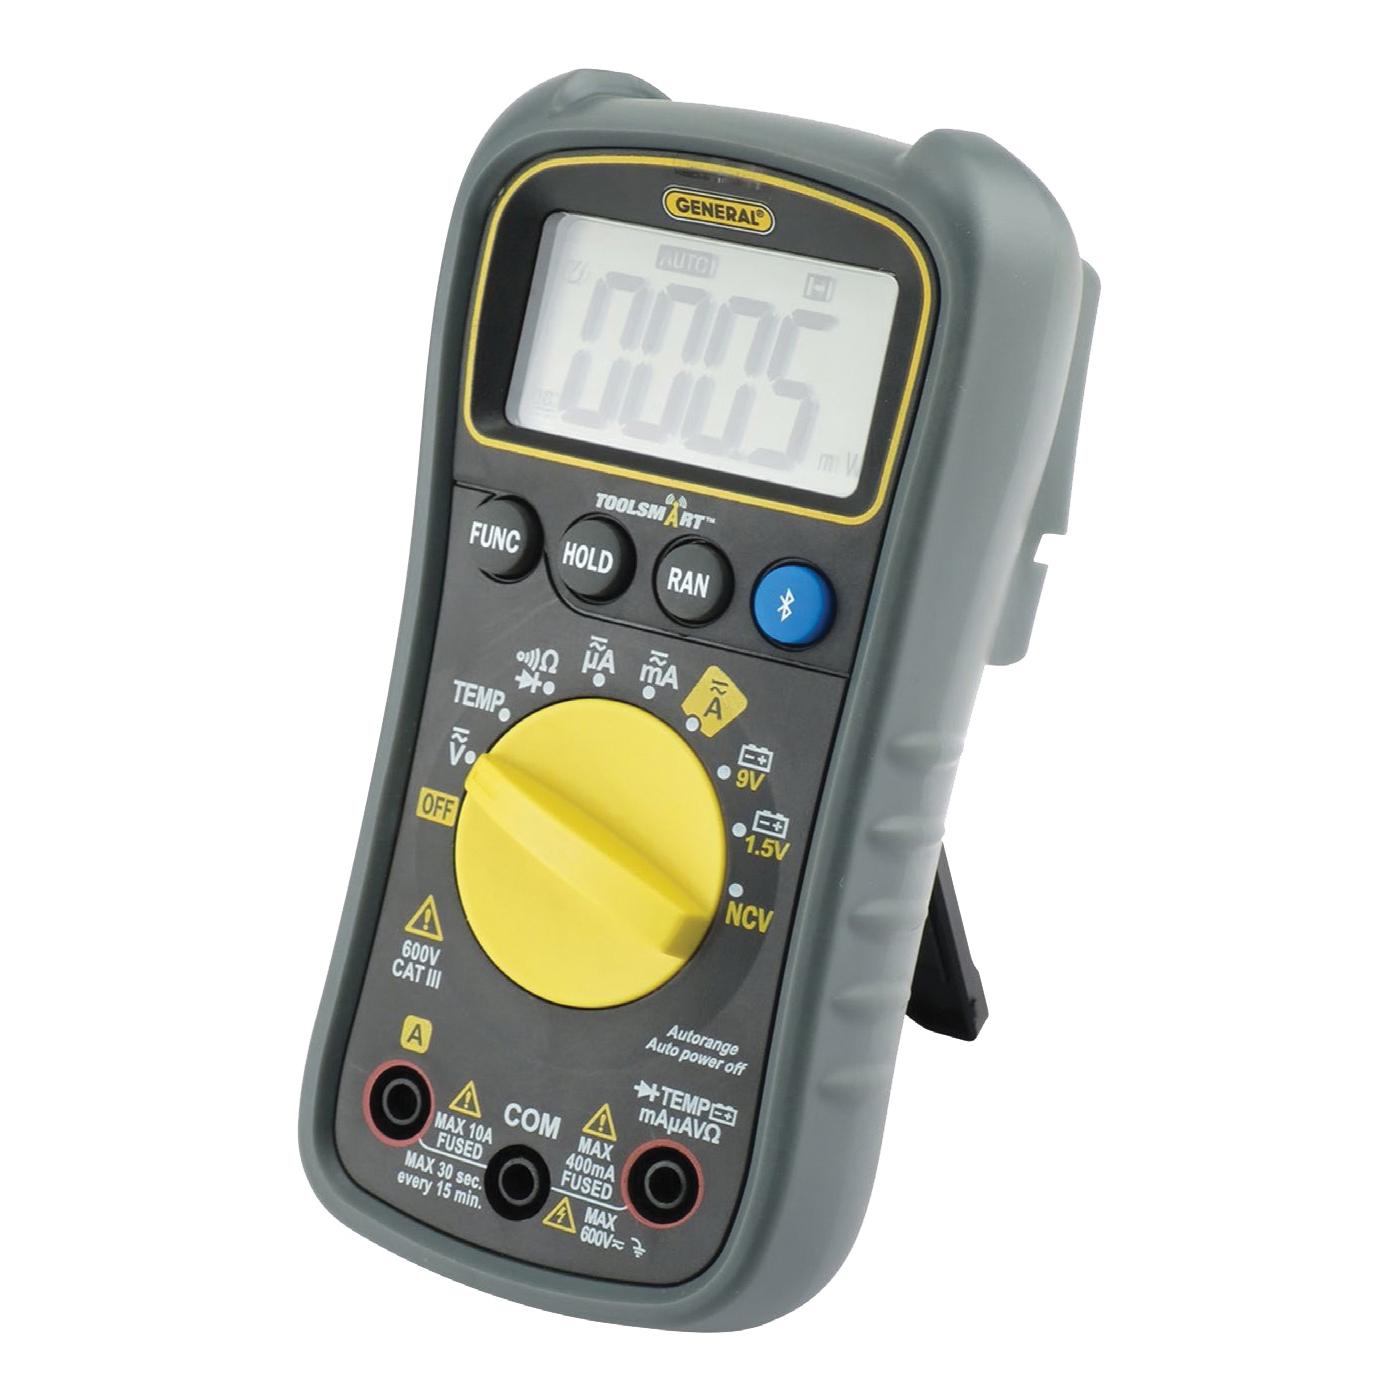 Picture of GENERAL ToolSmart TS04 Digital Multimeter, Digital Display